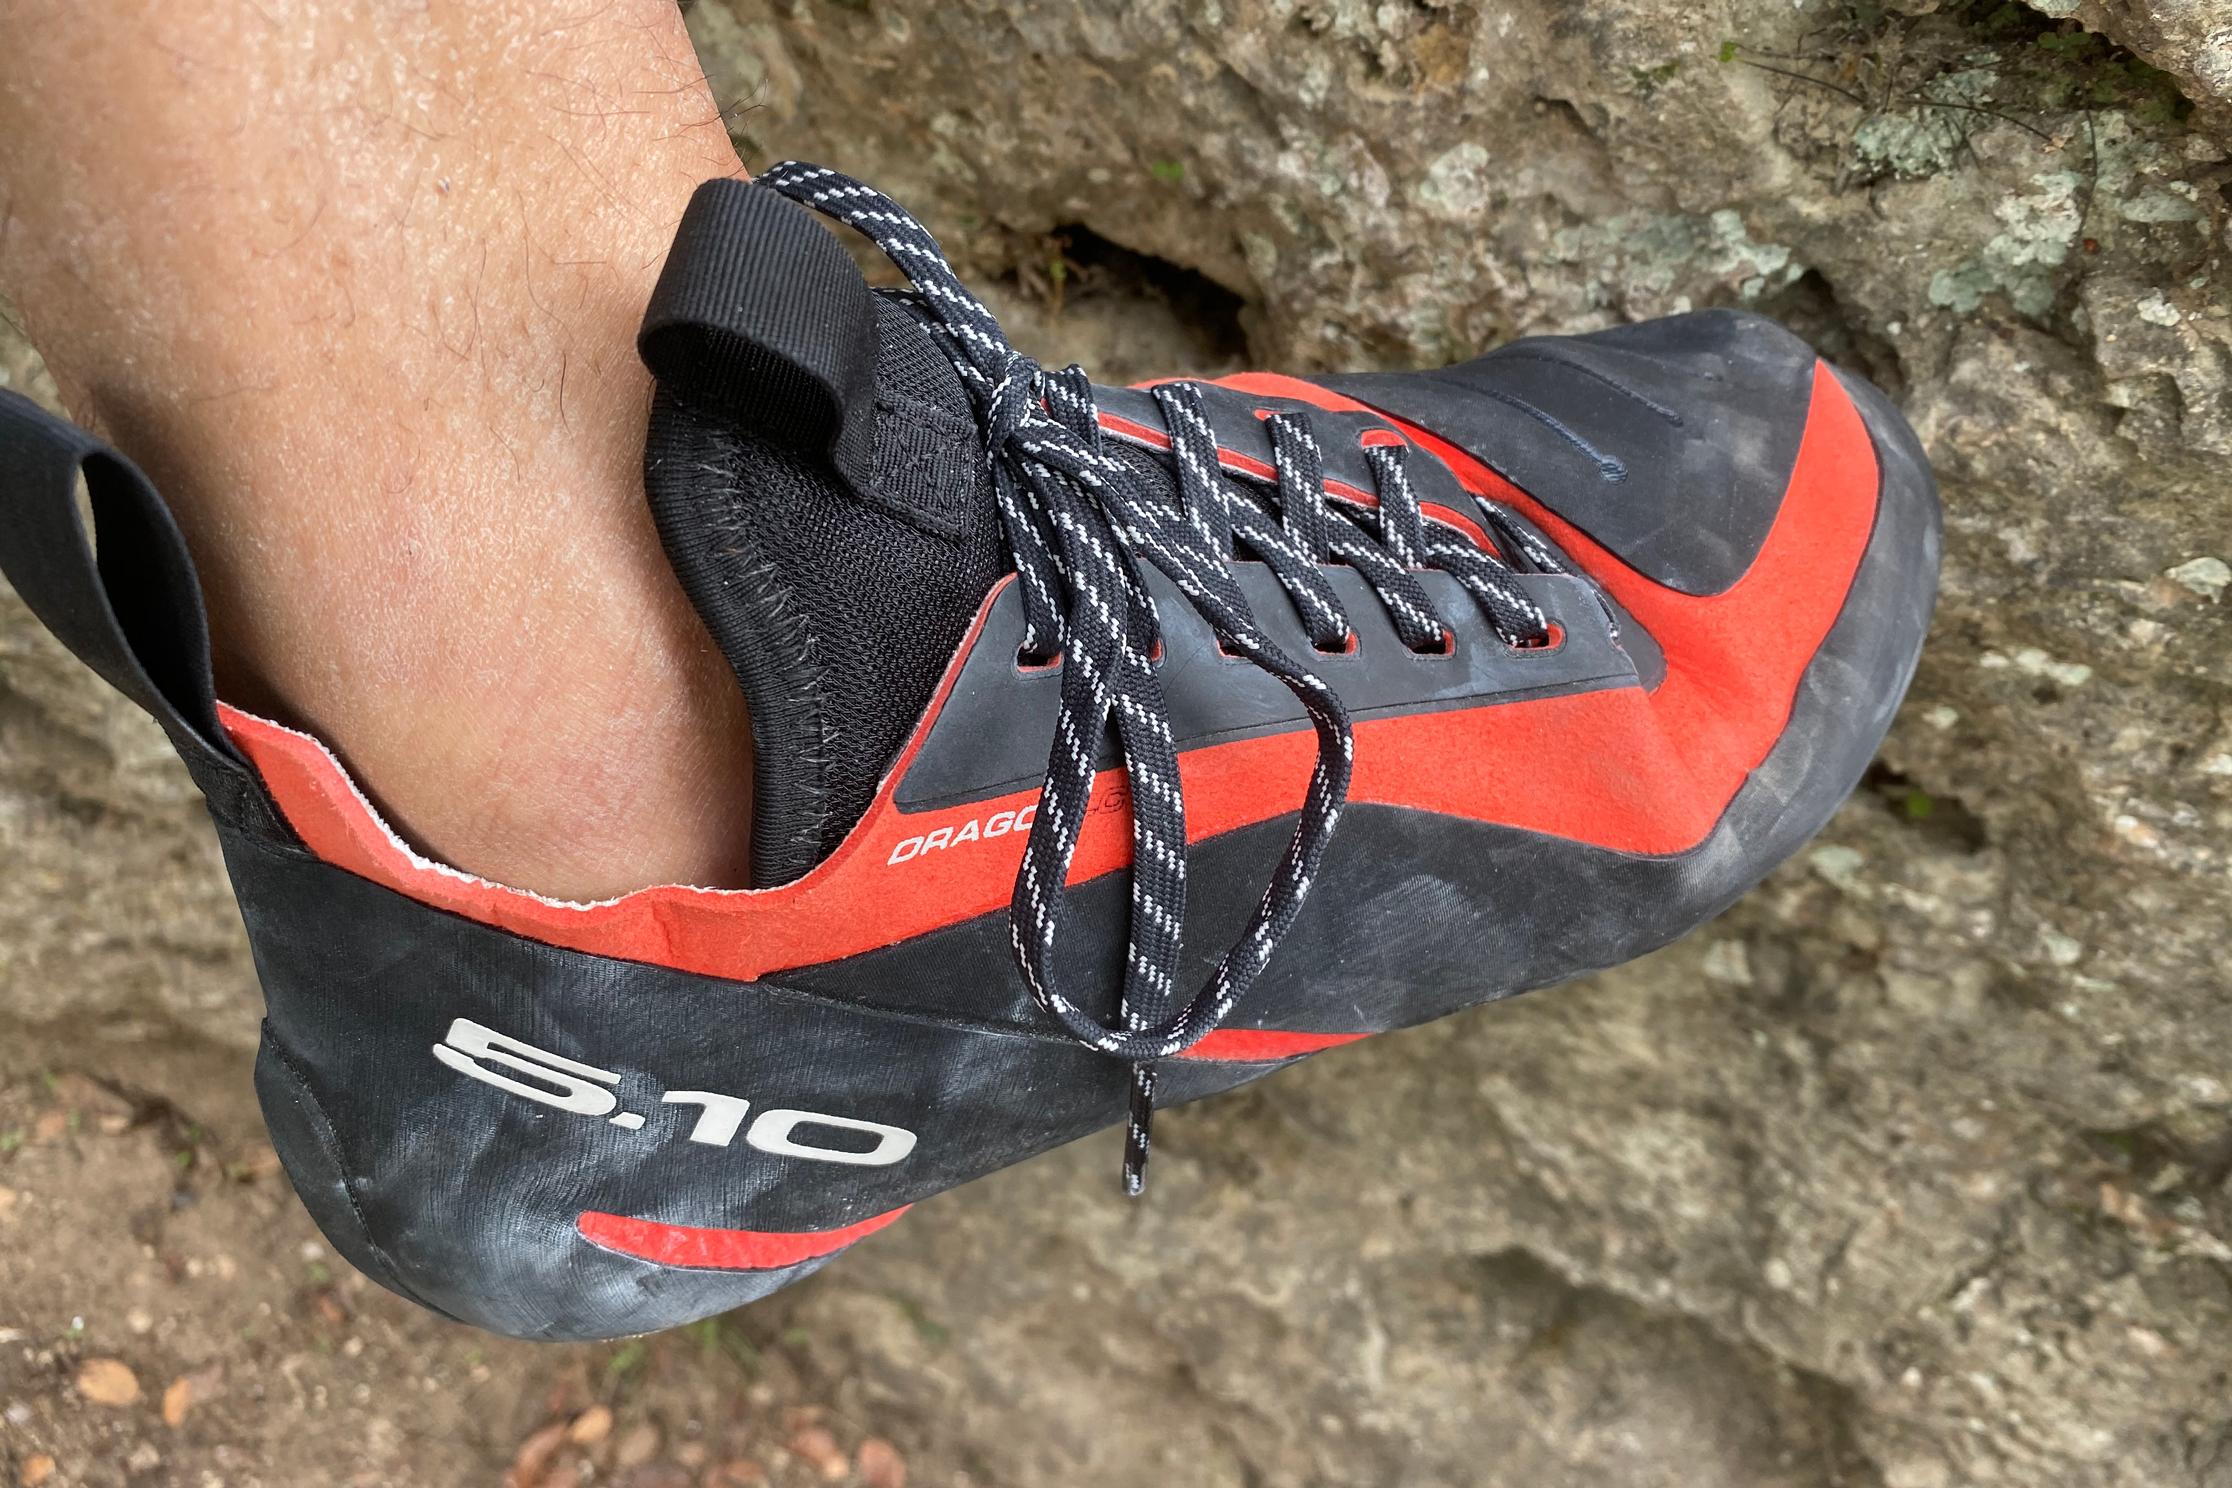 Five Ten Dragon climbing shoe on limestone